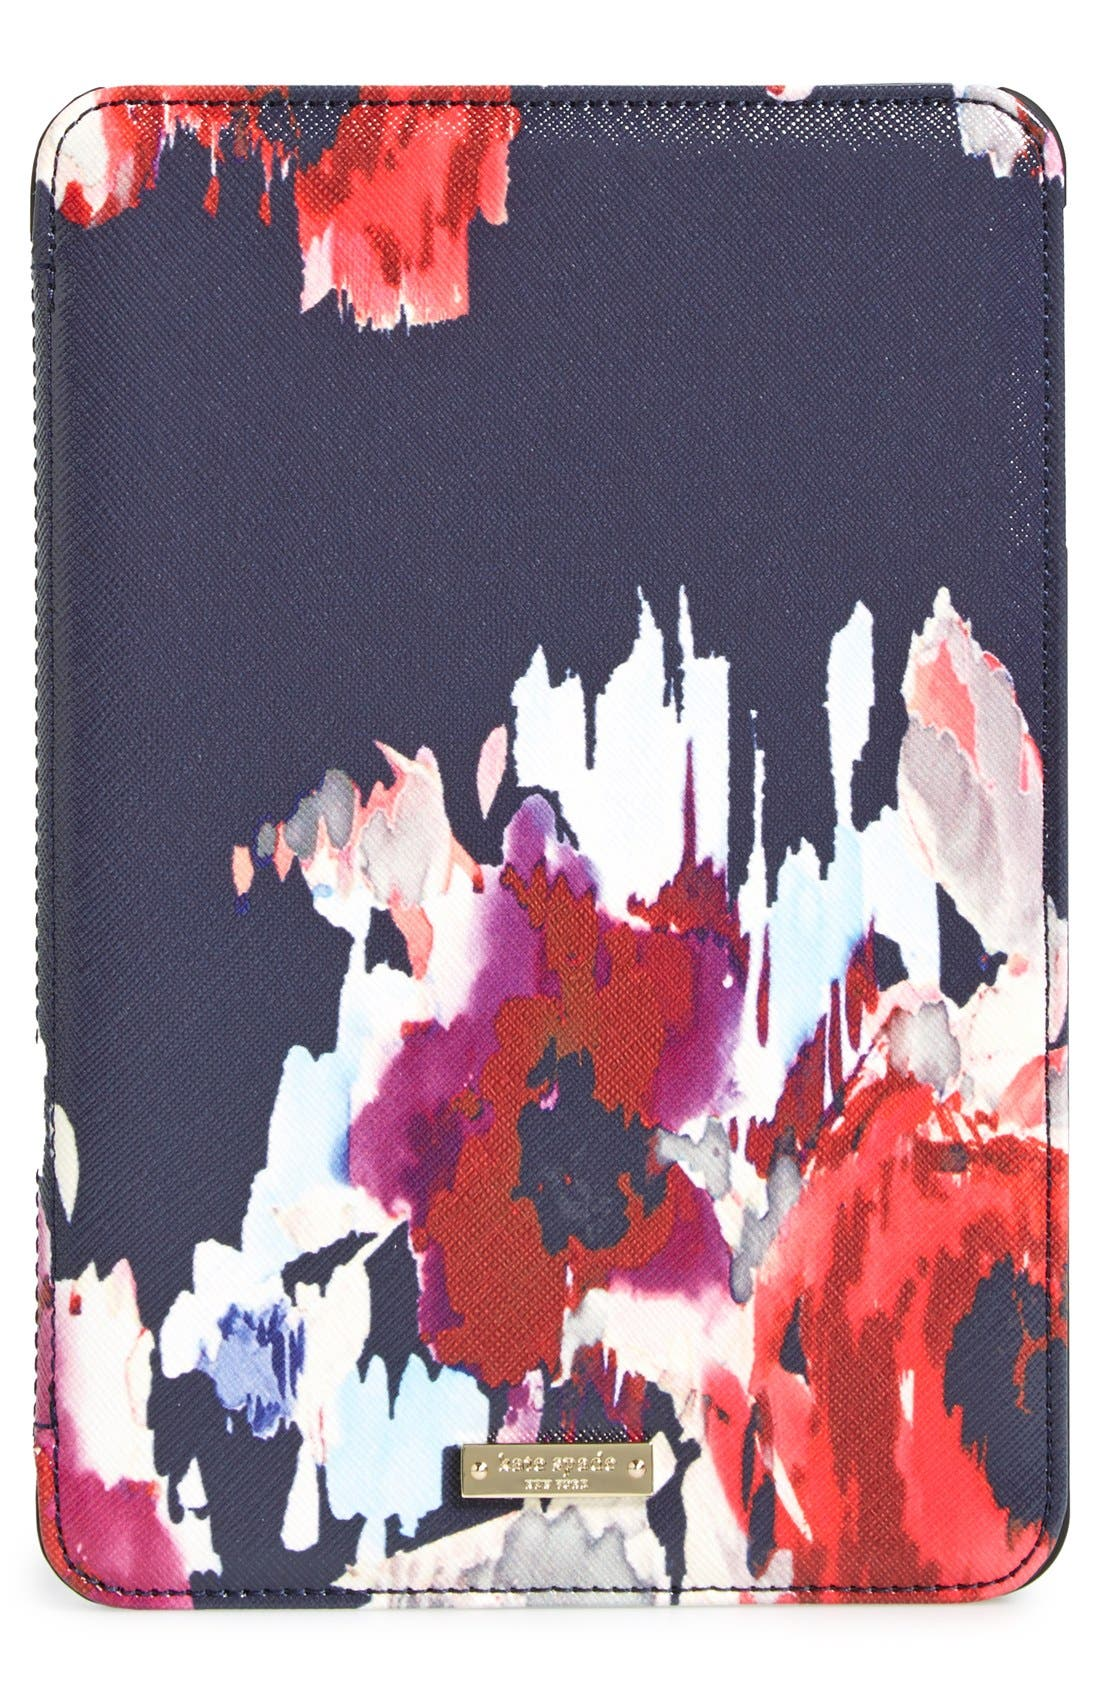 Main Image - kate spade new york 'hazy floral' iPad Mini hardcase folio